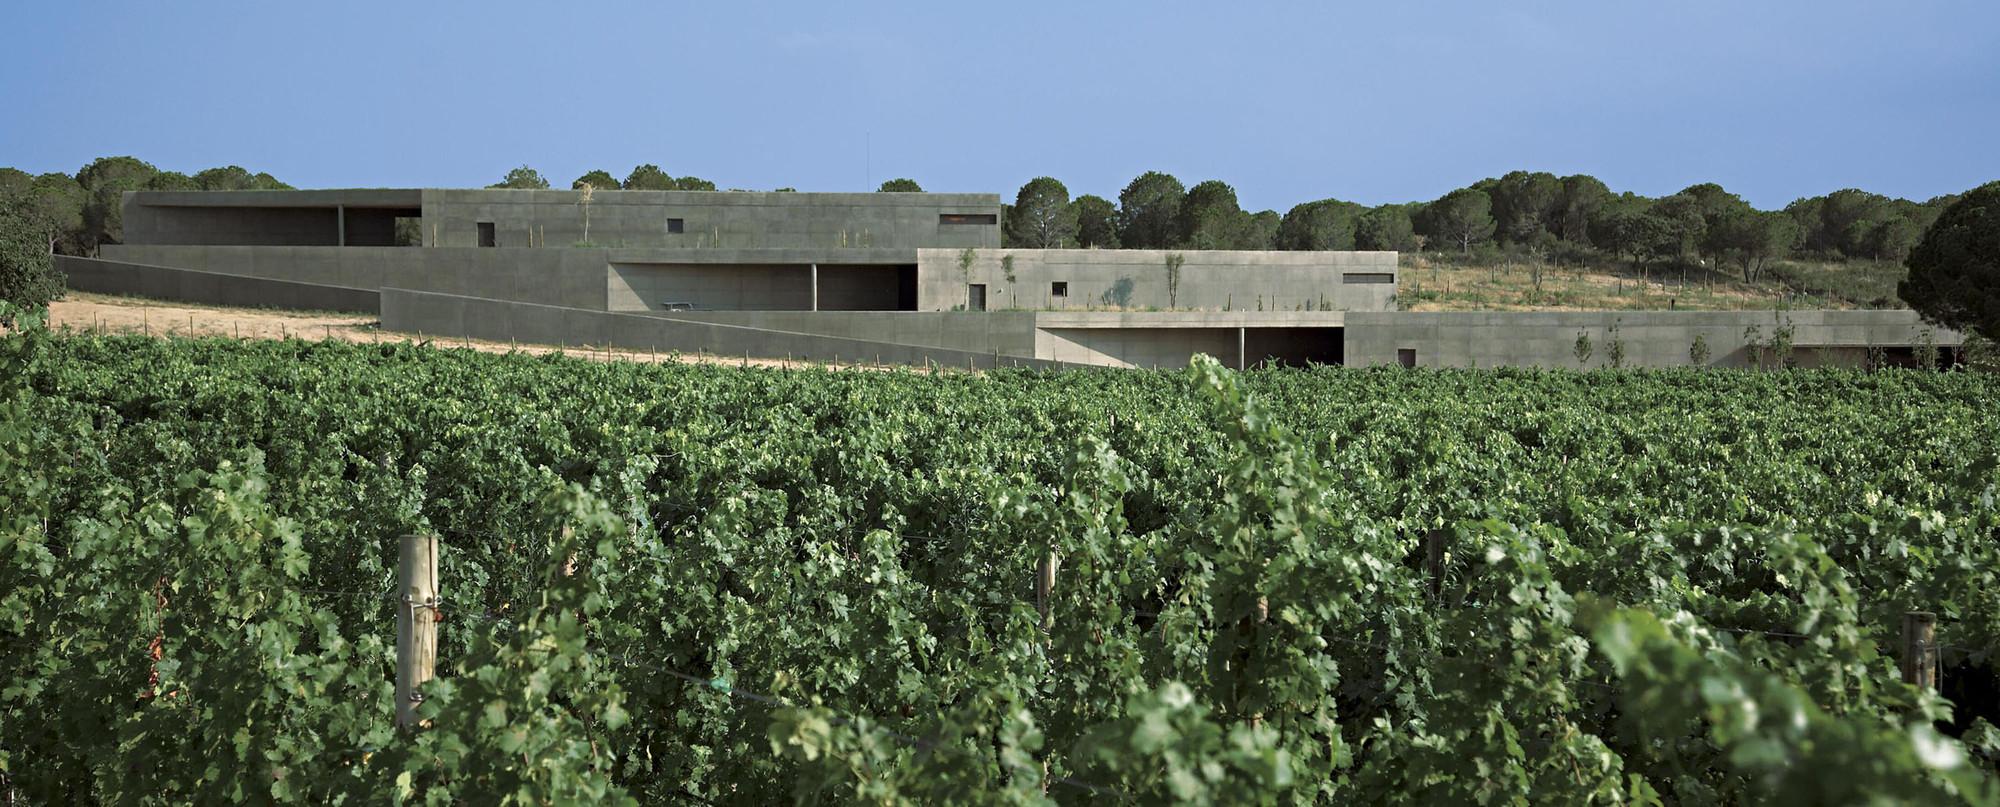 Terra Remota Winery / Untaller, © Lluís Casals